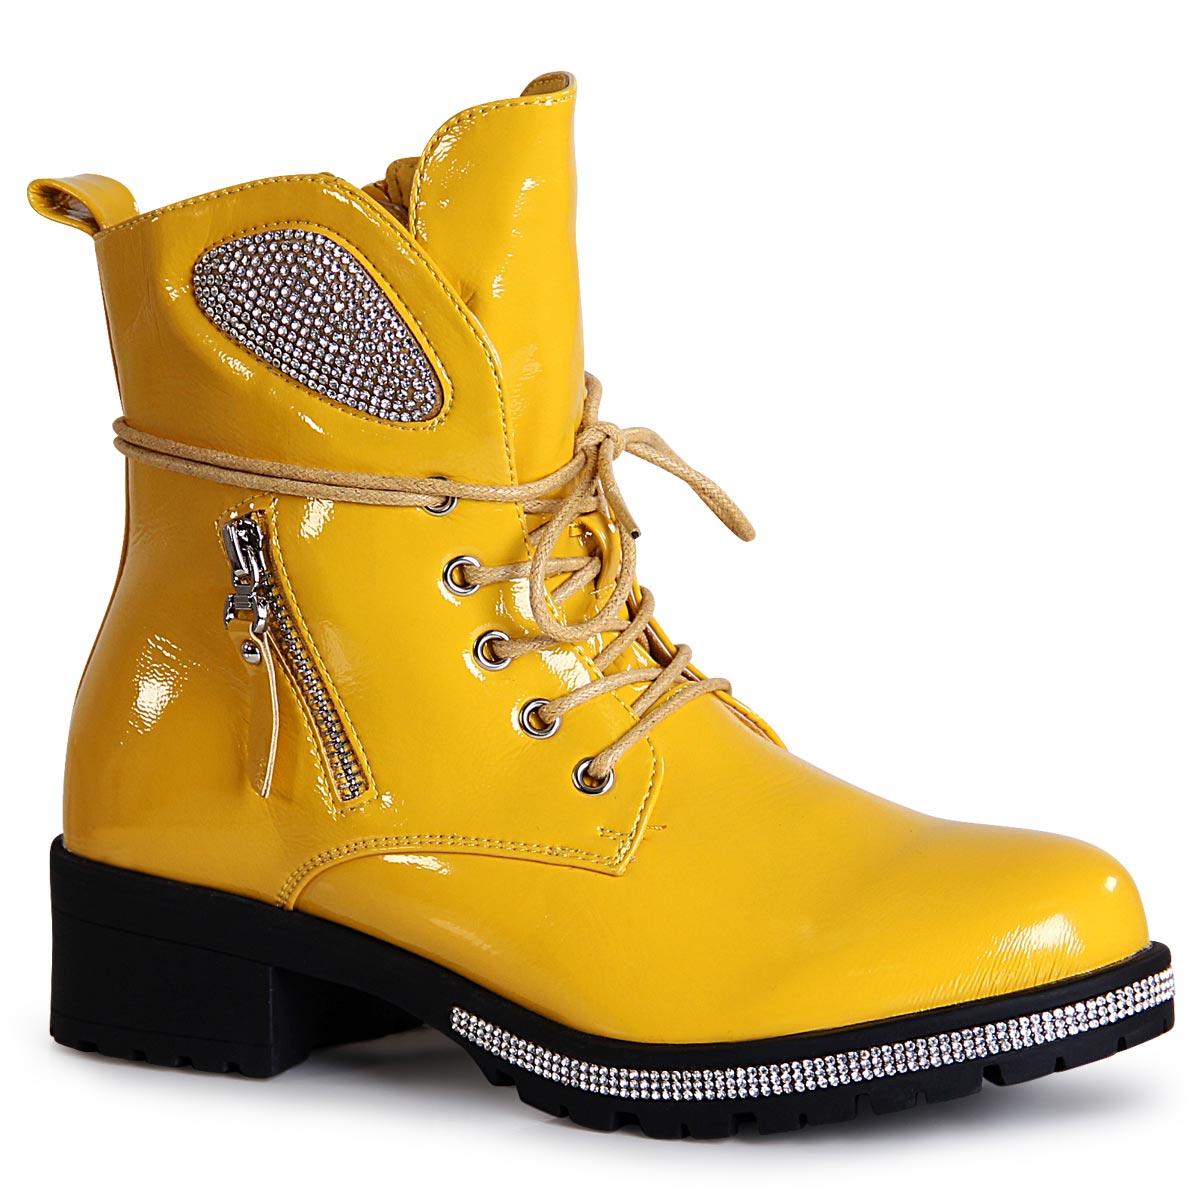 Details about Ladies Platform Ankle Boots Glitter Worker Biker Boots Booties Boots show original title